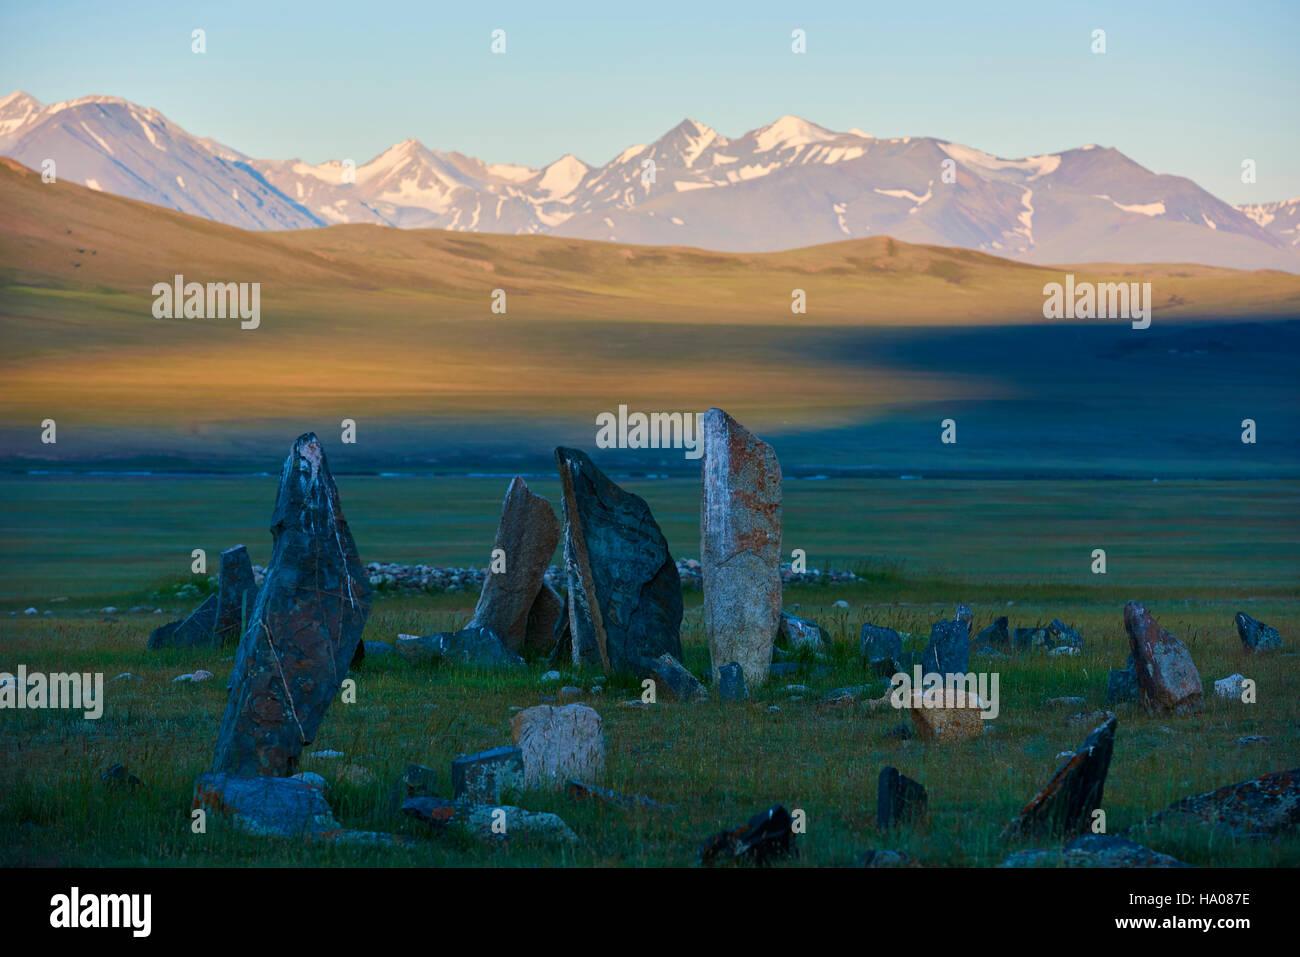 Mongolia, Bayan-Ulgii province, western Mongolia, National parc of Tavan Bogd, deer stone, funeral site, monolithic - Stock Image